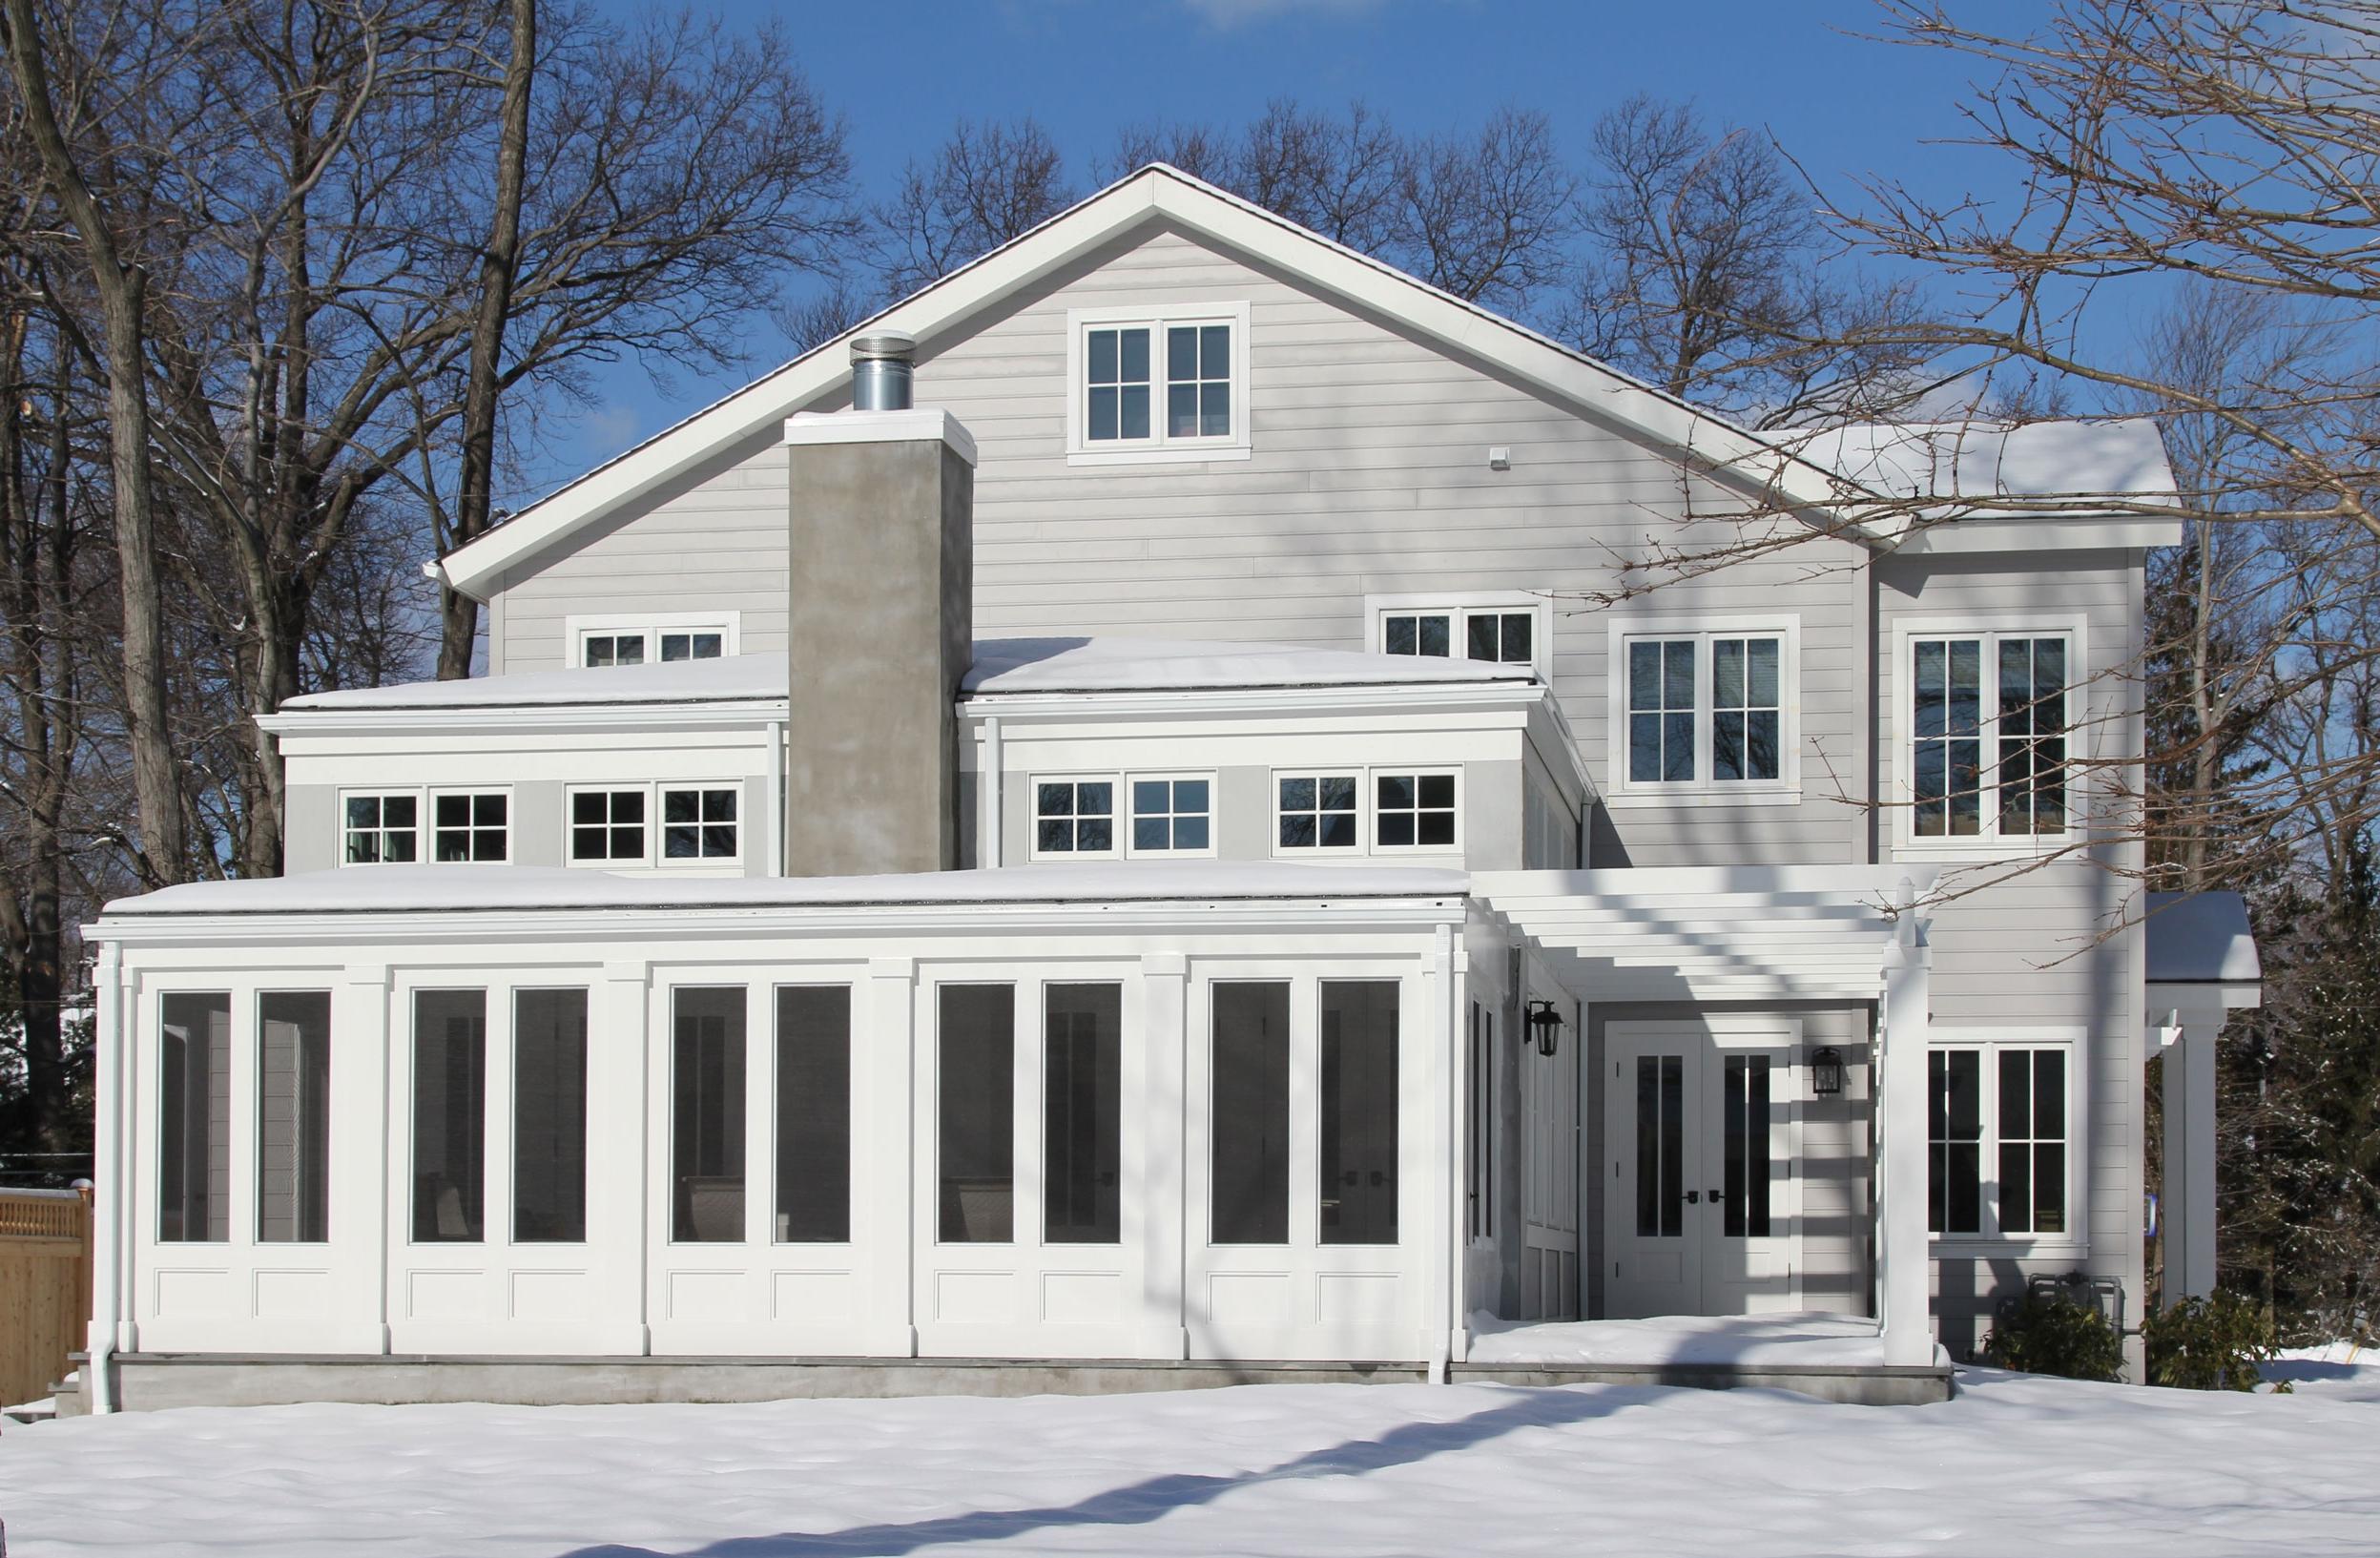 Greenwich-new-home-winter-porch.jpg